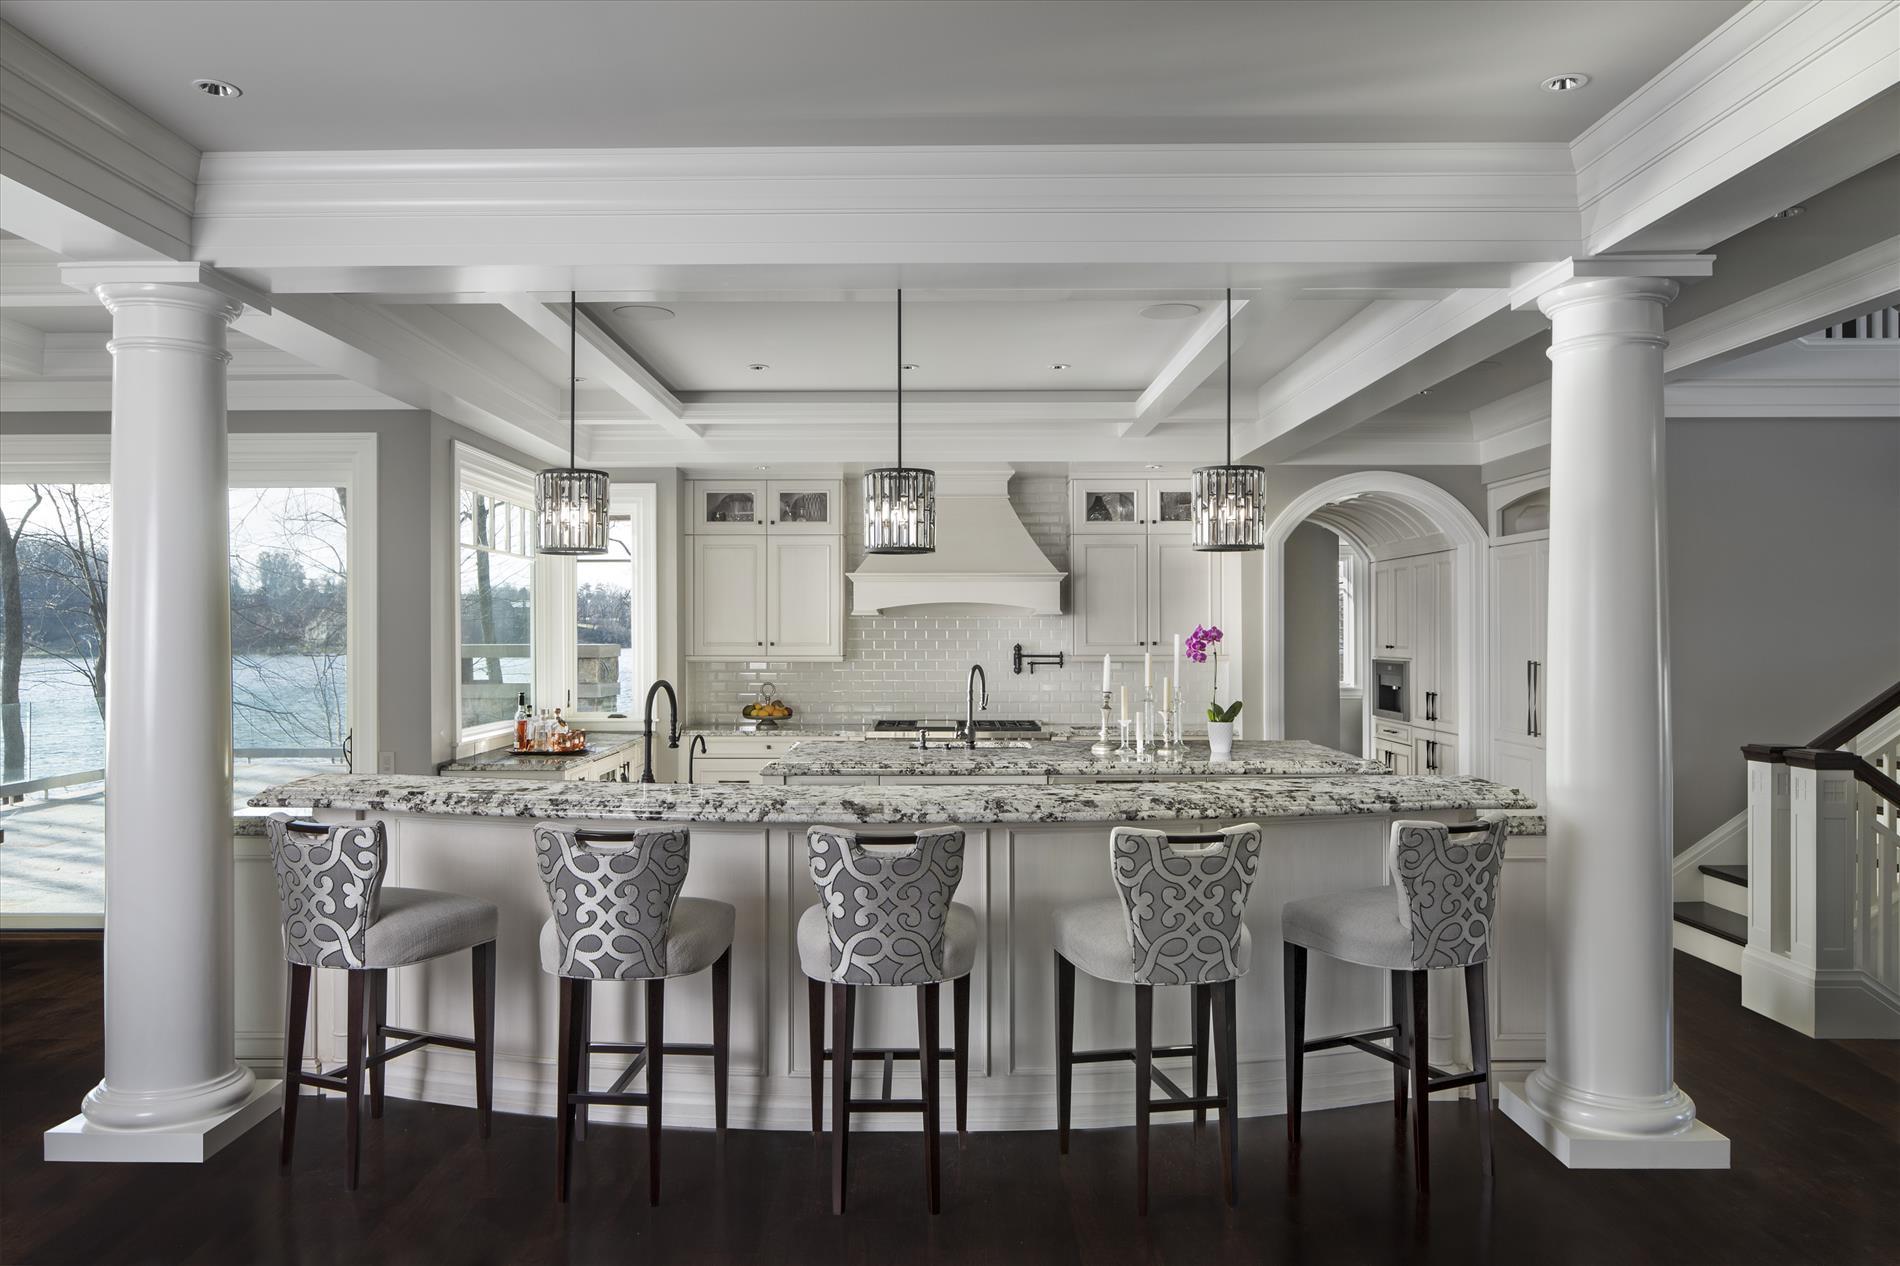 kitchen remodeling birmingham mi table centerpiece design contest  trevarrow inc of auburn hills